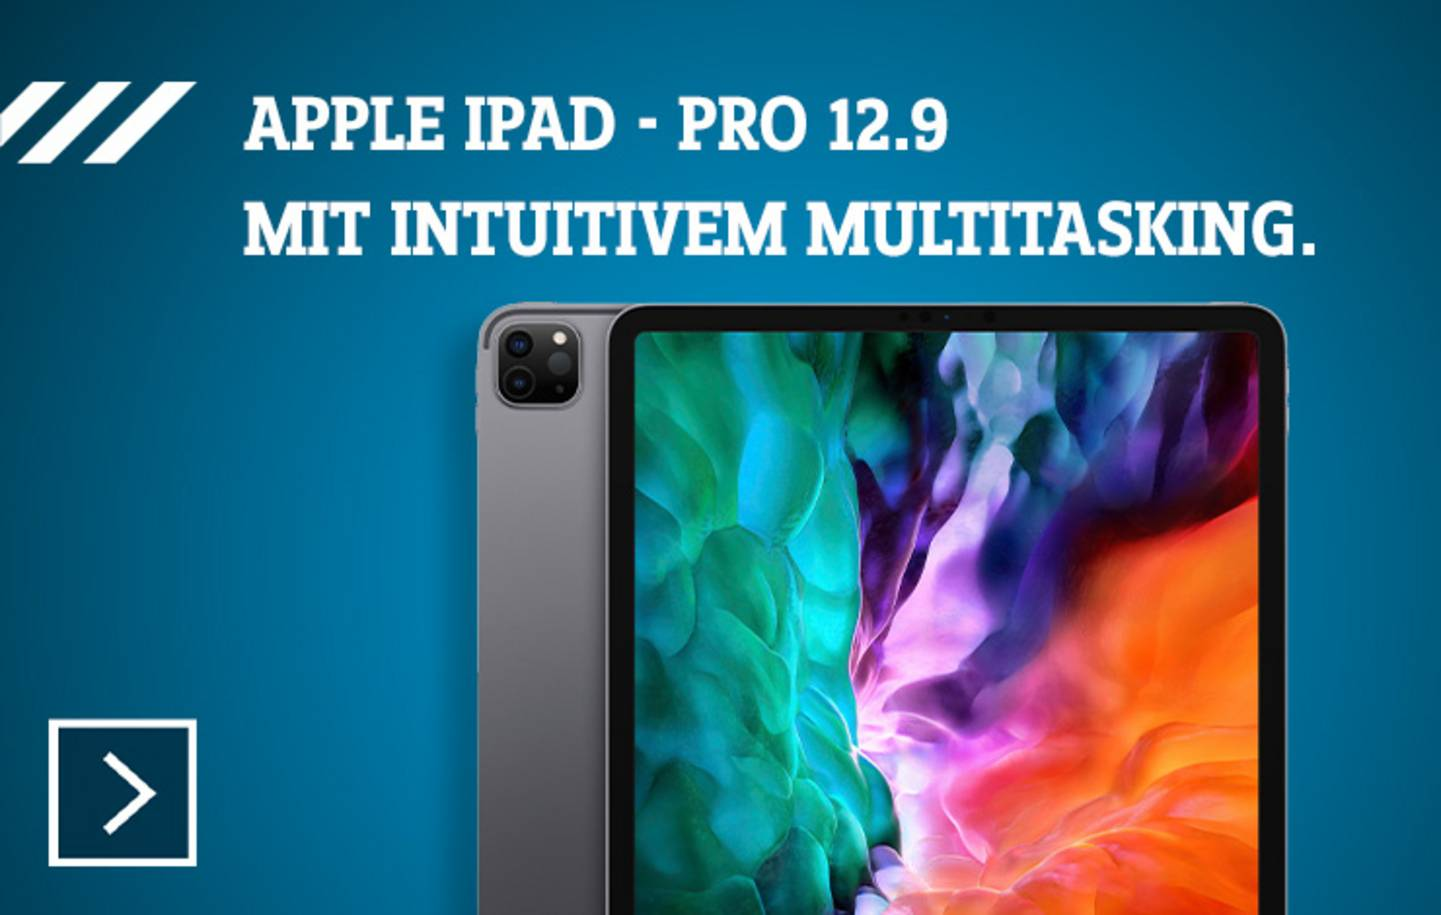 Apple iPad - Pro 12.9 »